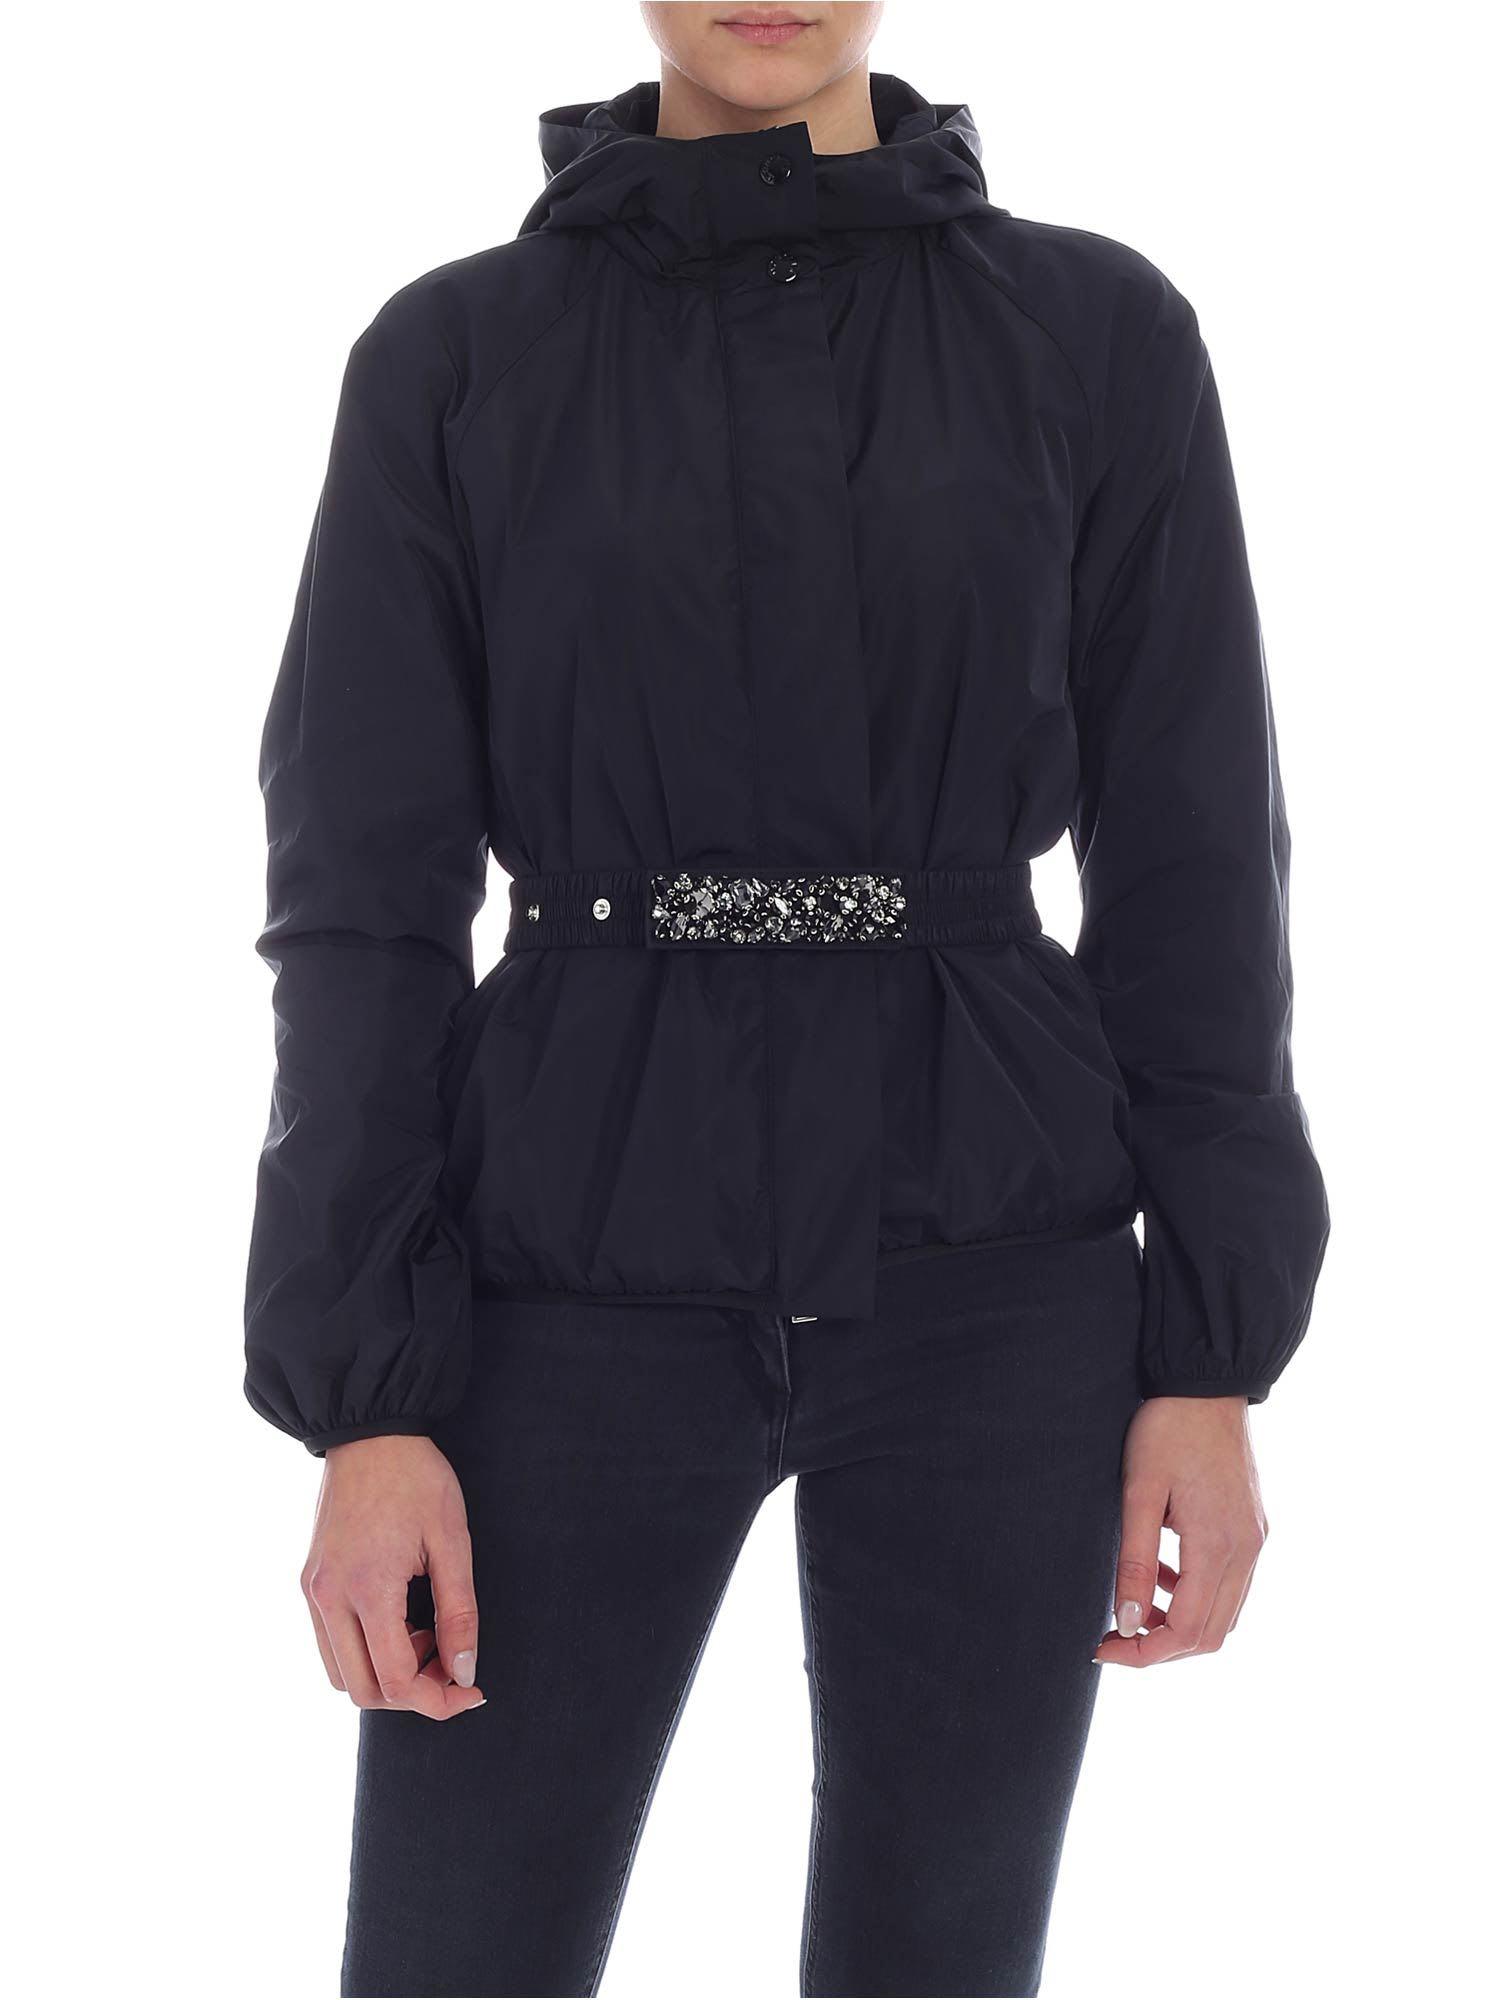 Moncler – Asuncion Jacket